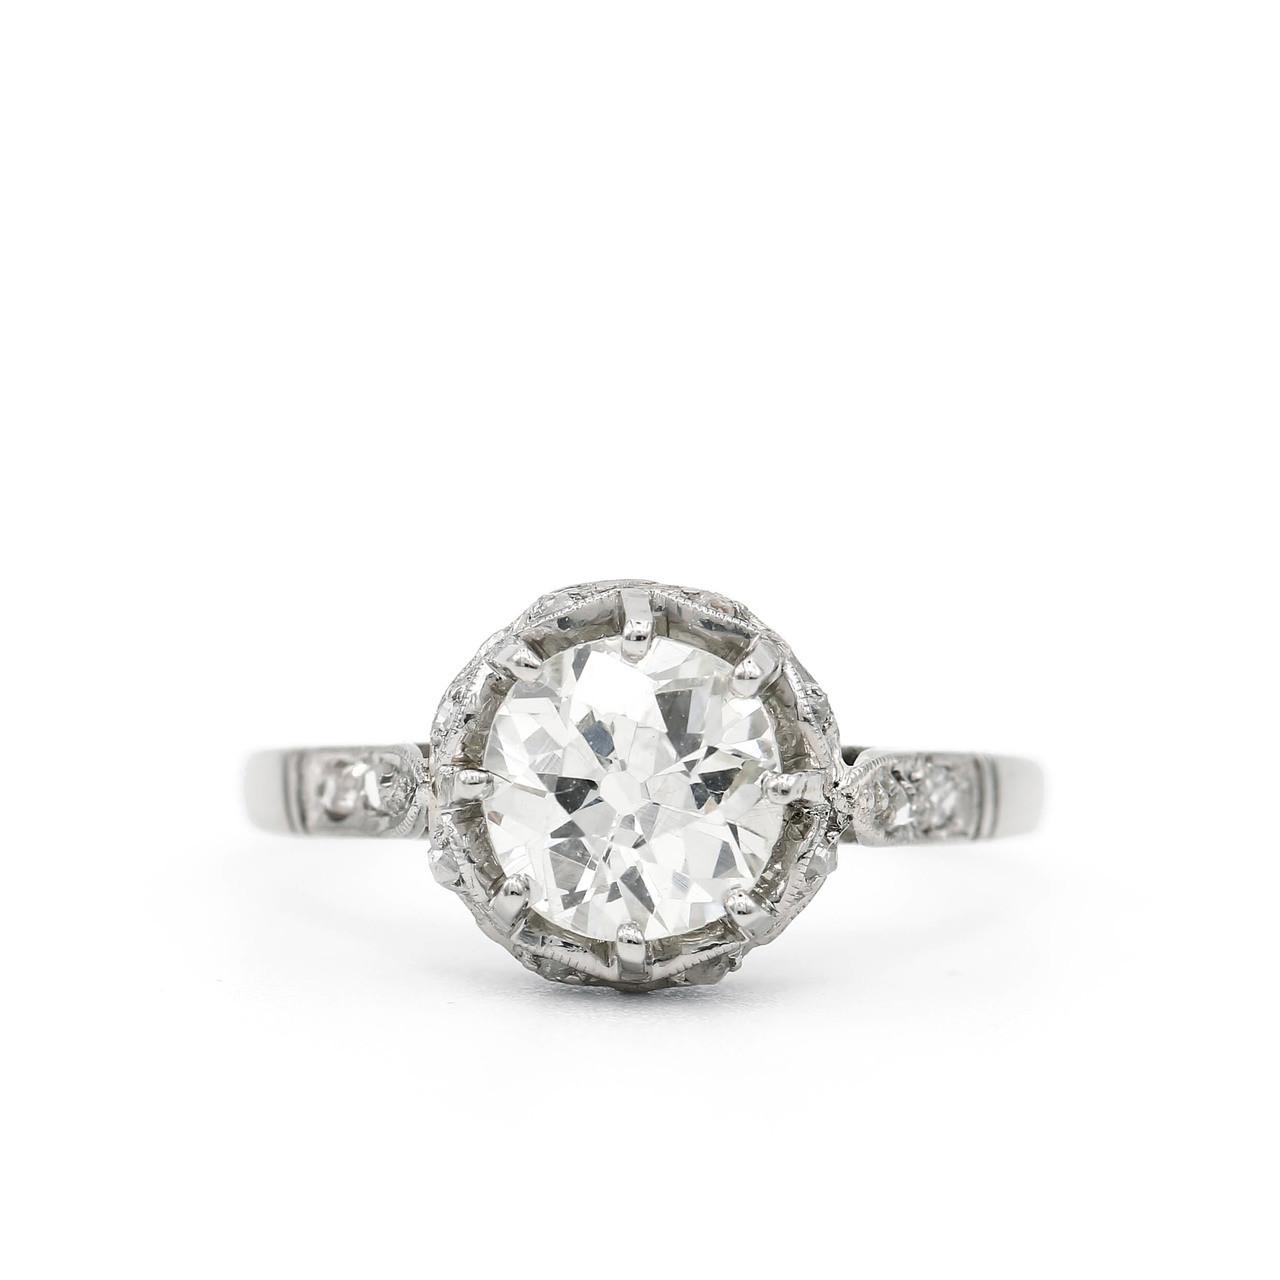 b066f09d876d3 Platinum 1.11 Carat Old European & Rose Cut Diamond Ring